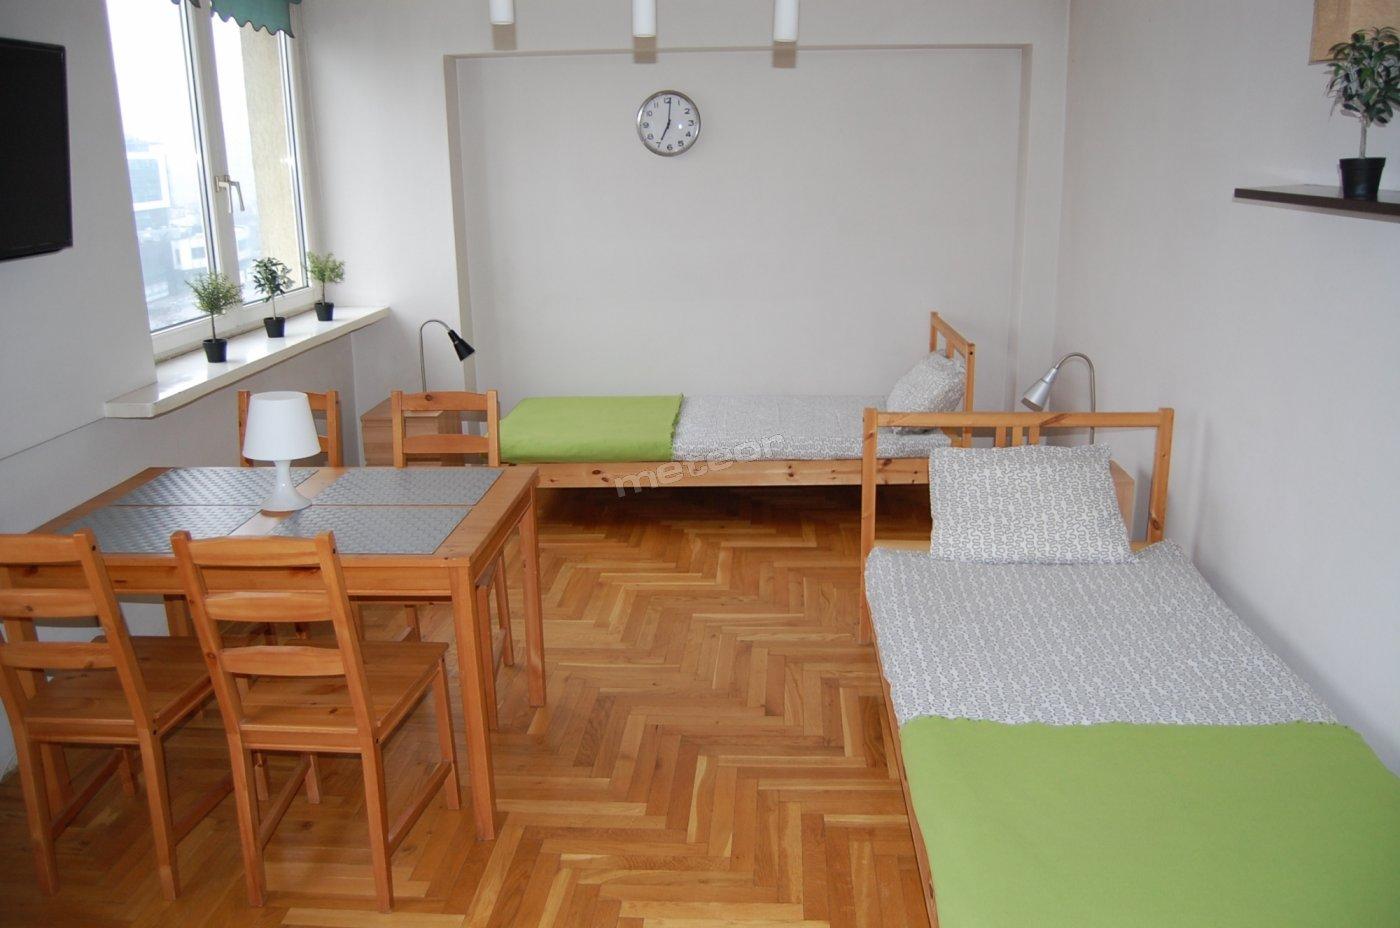 Silesia Tanie Noclegi Pracownicze